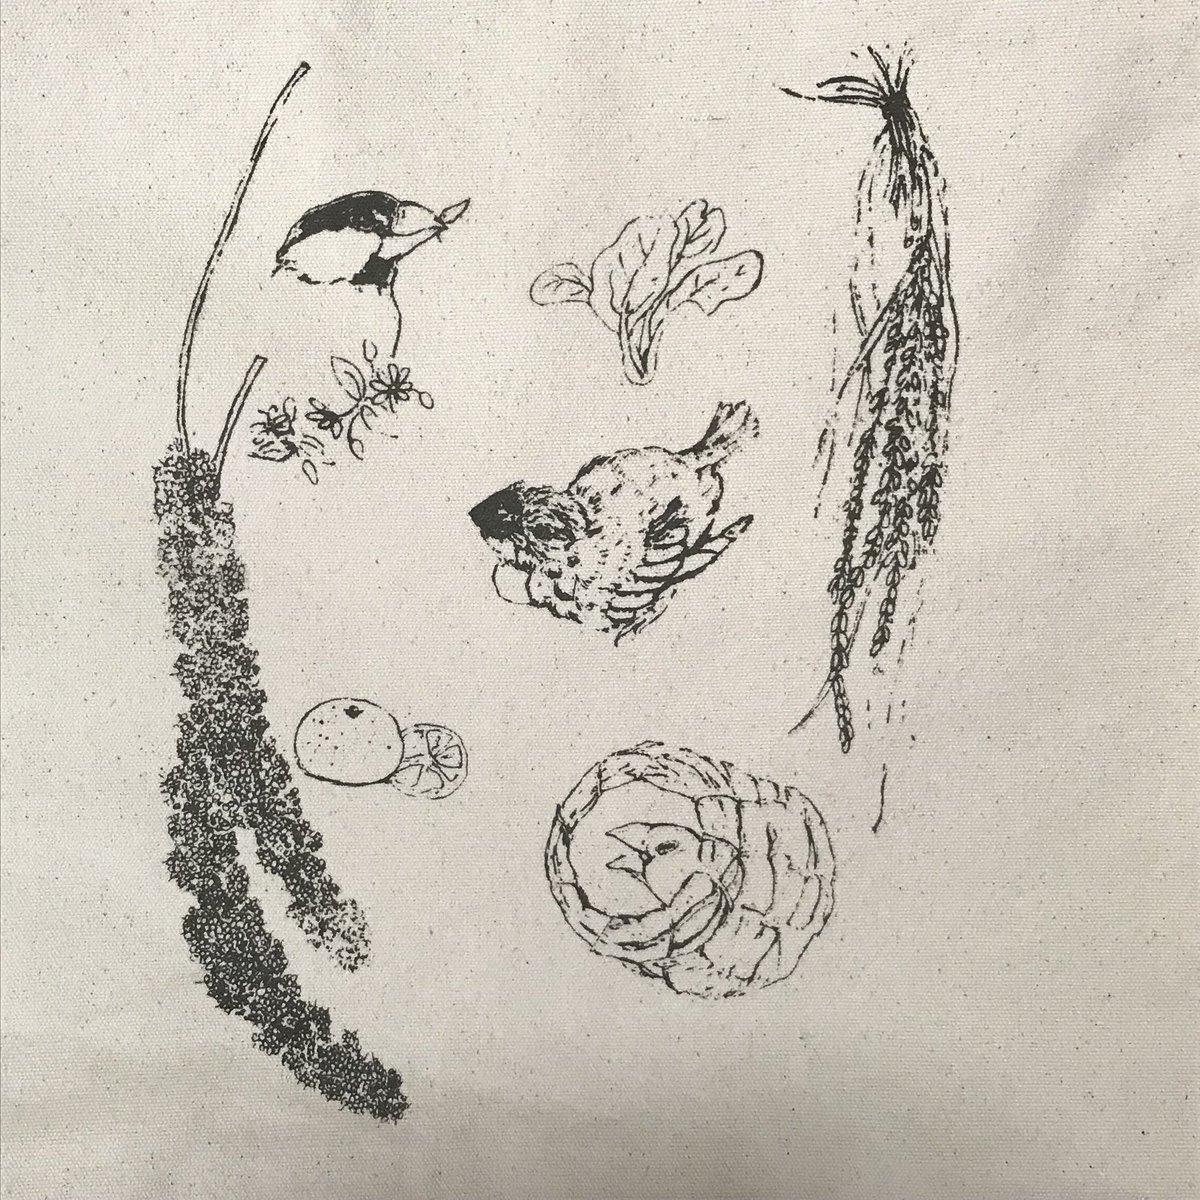 test ツイッターメディア - 文鳥まつりに新柄が間に合いました!これから繁殖シーズン。そんな文鳥さんたちを応援したくて、大好きな食べ物やヒナなどを描きました。 クリスマスリース柄のバッグもありますよ #文鳥まつり2019 https://t.co/ZYXziNdDSB